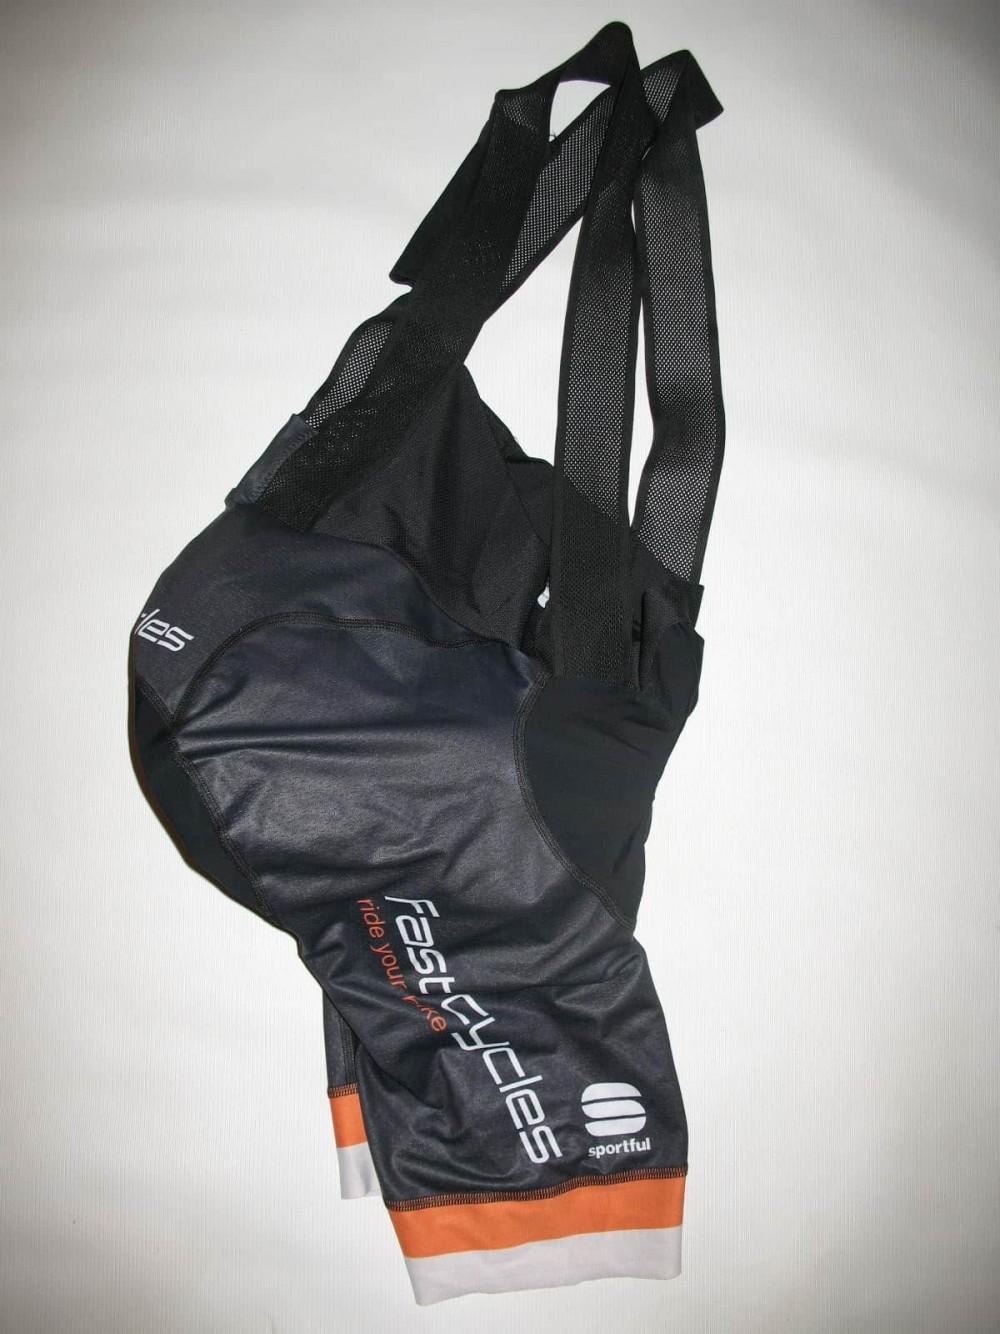 Велошорты SPORTFUL fast cycles bib shorts (размер L) - 2